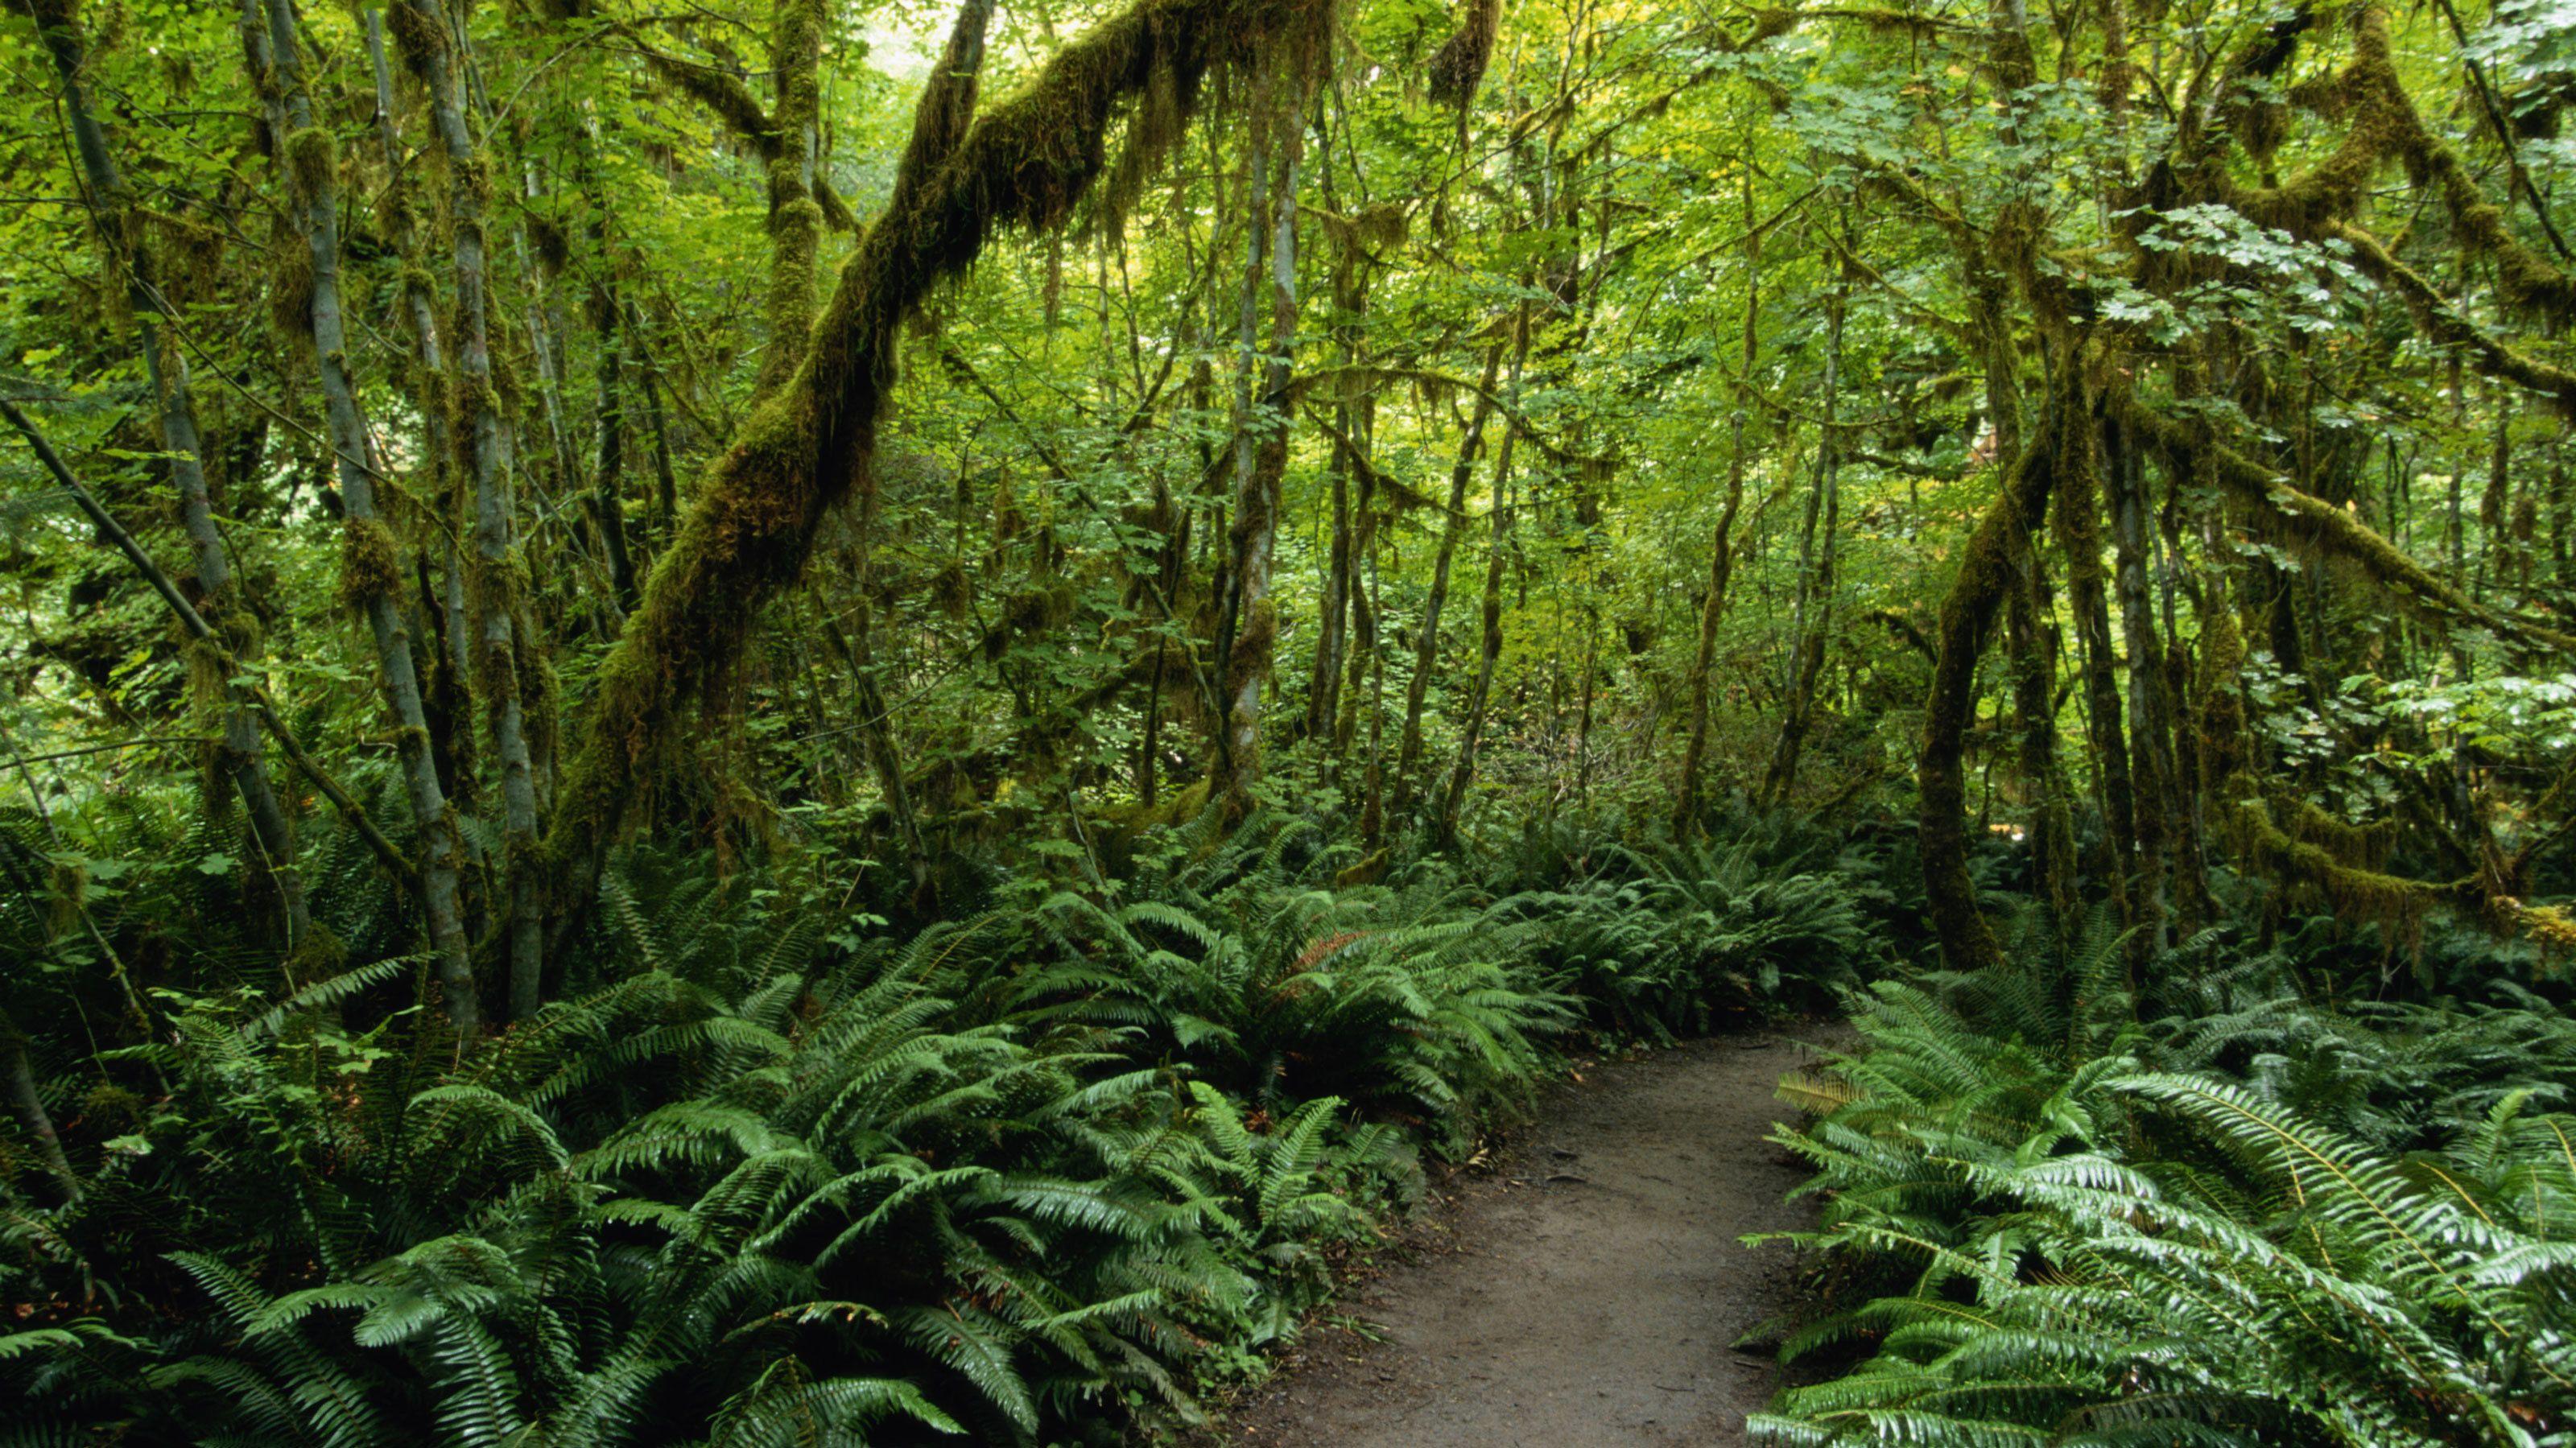 Path through the lush Tijuca forest in Rio de Janeiro